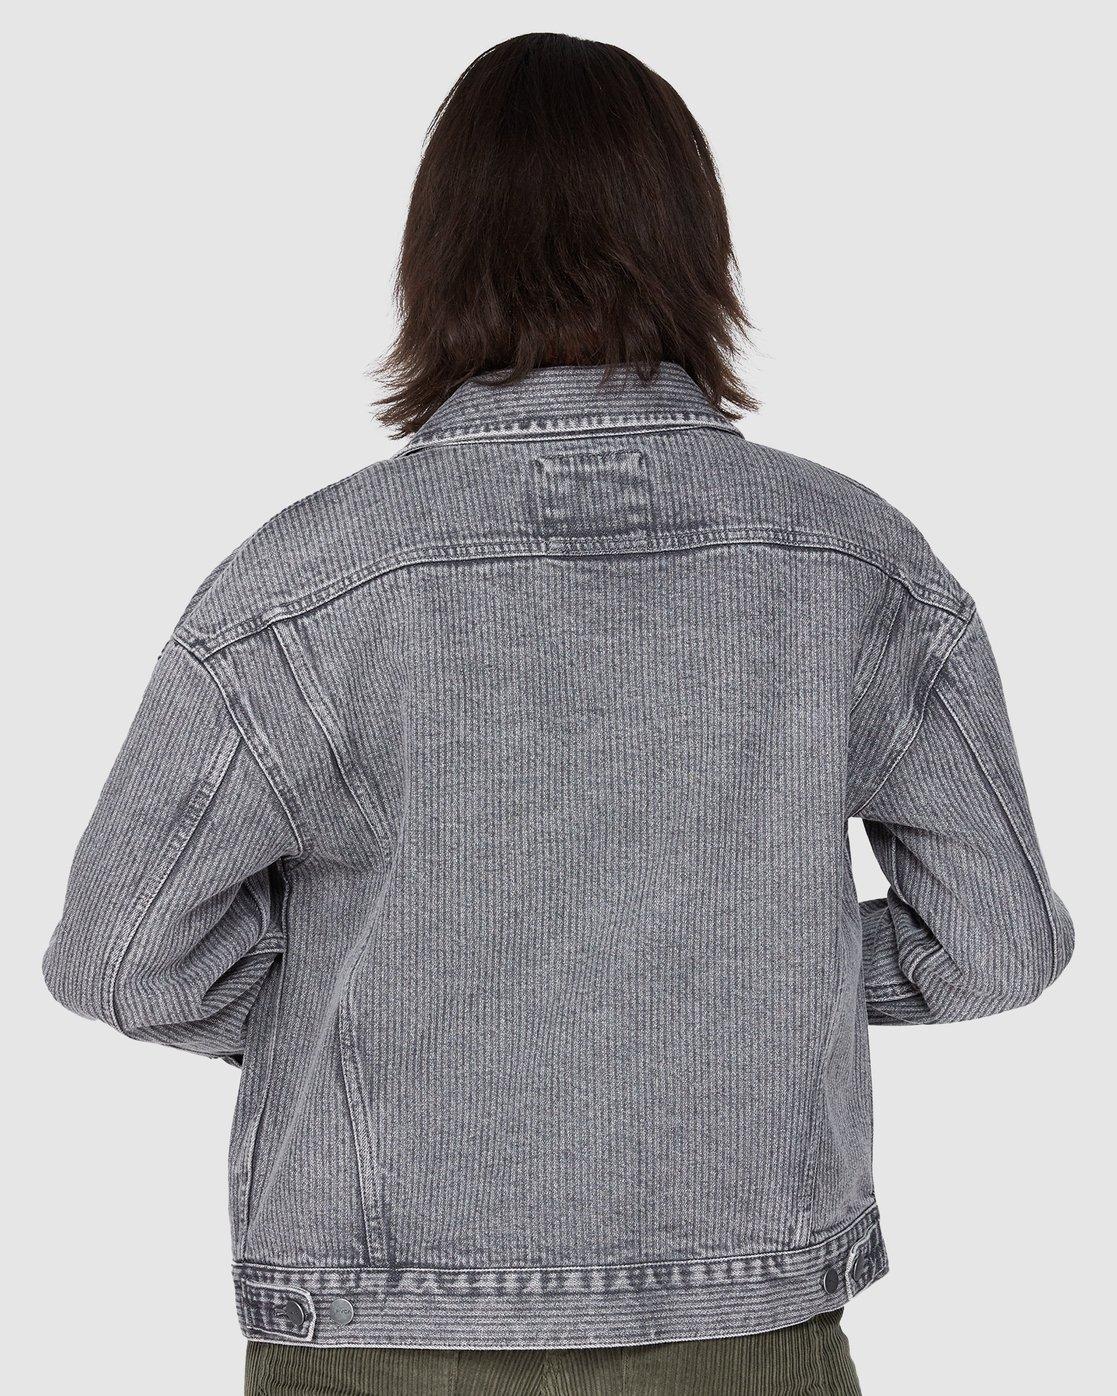 2 Slouch Dnm Jacket - Gry Stripe Grey R207440 RVCA